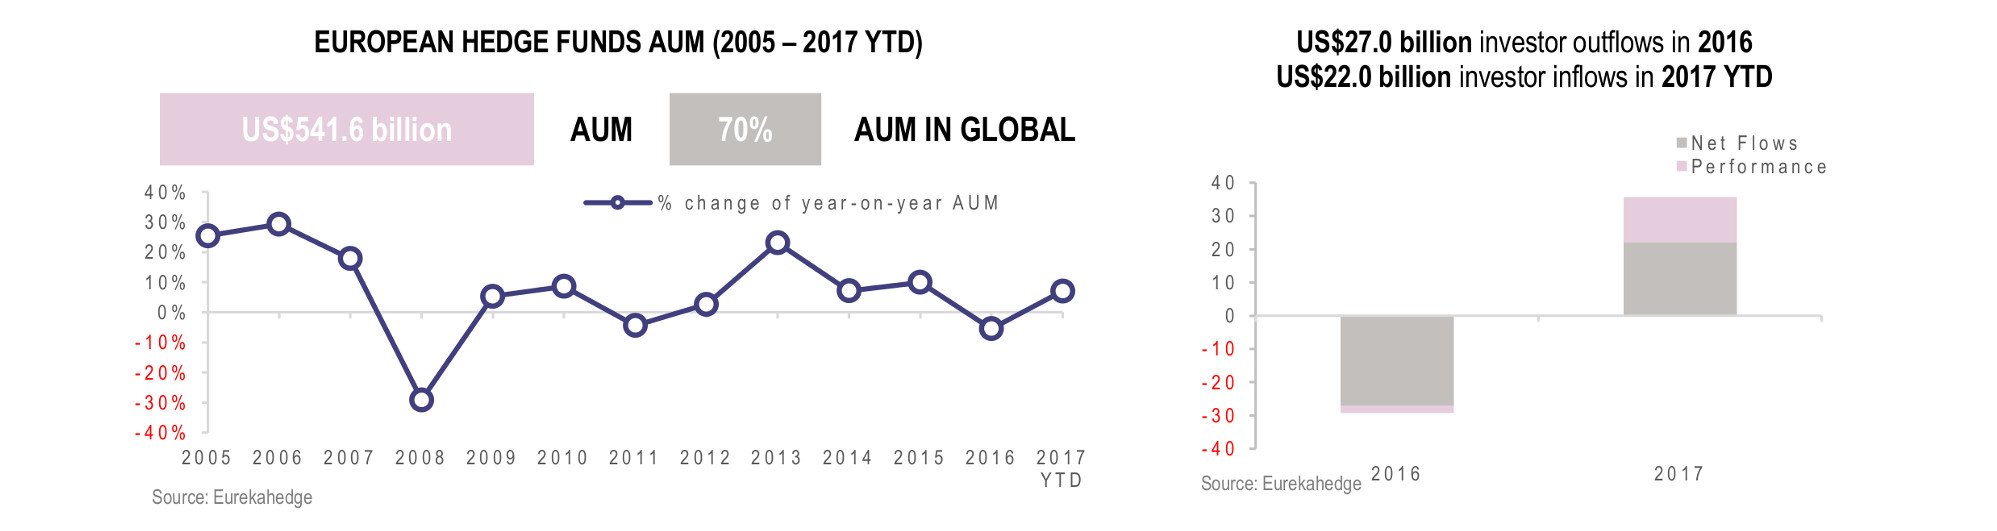 European Hedge Fund Infographic December 2017- AUM